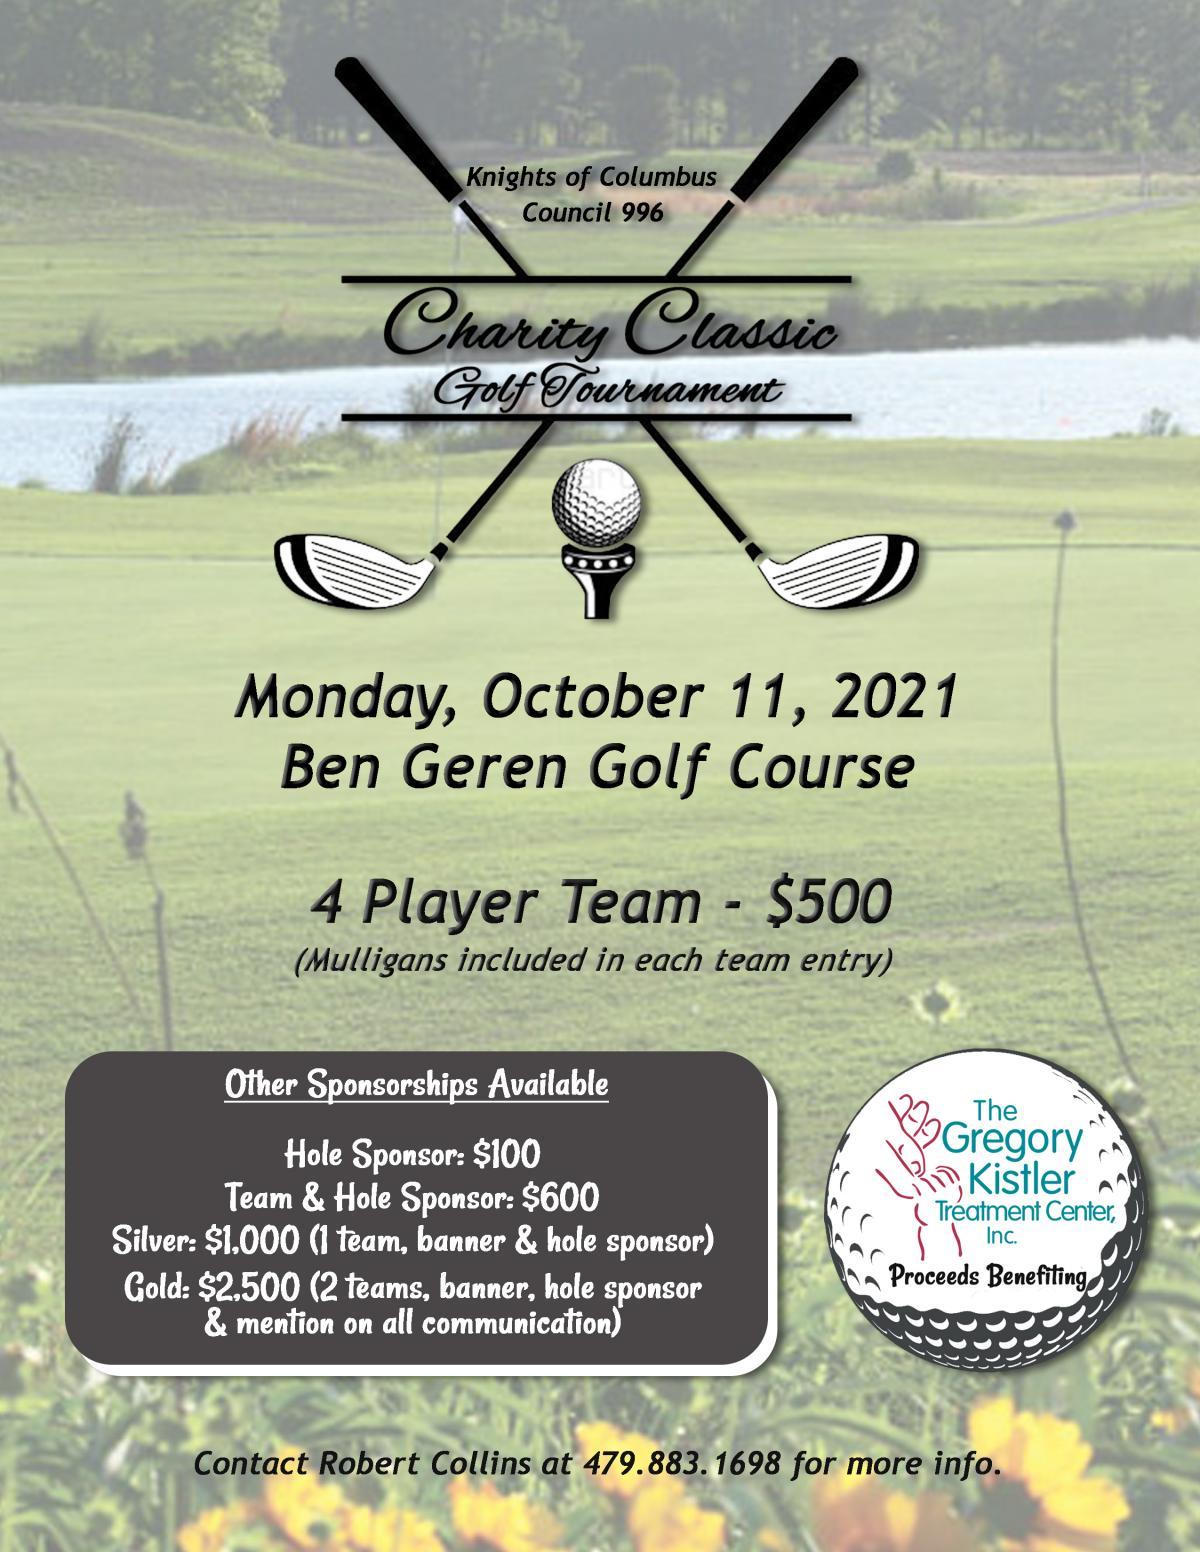 images/general/KOC-Golf-Tournament-Flyer-2021.jpg